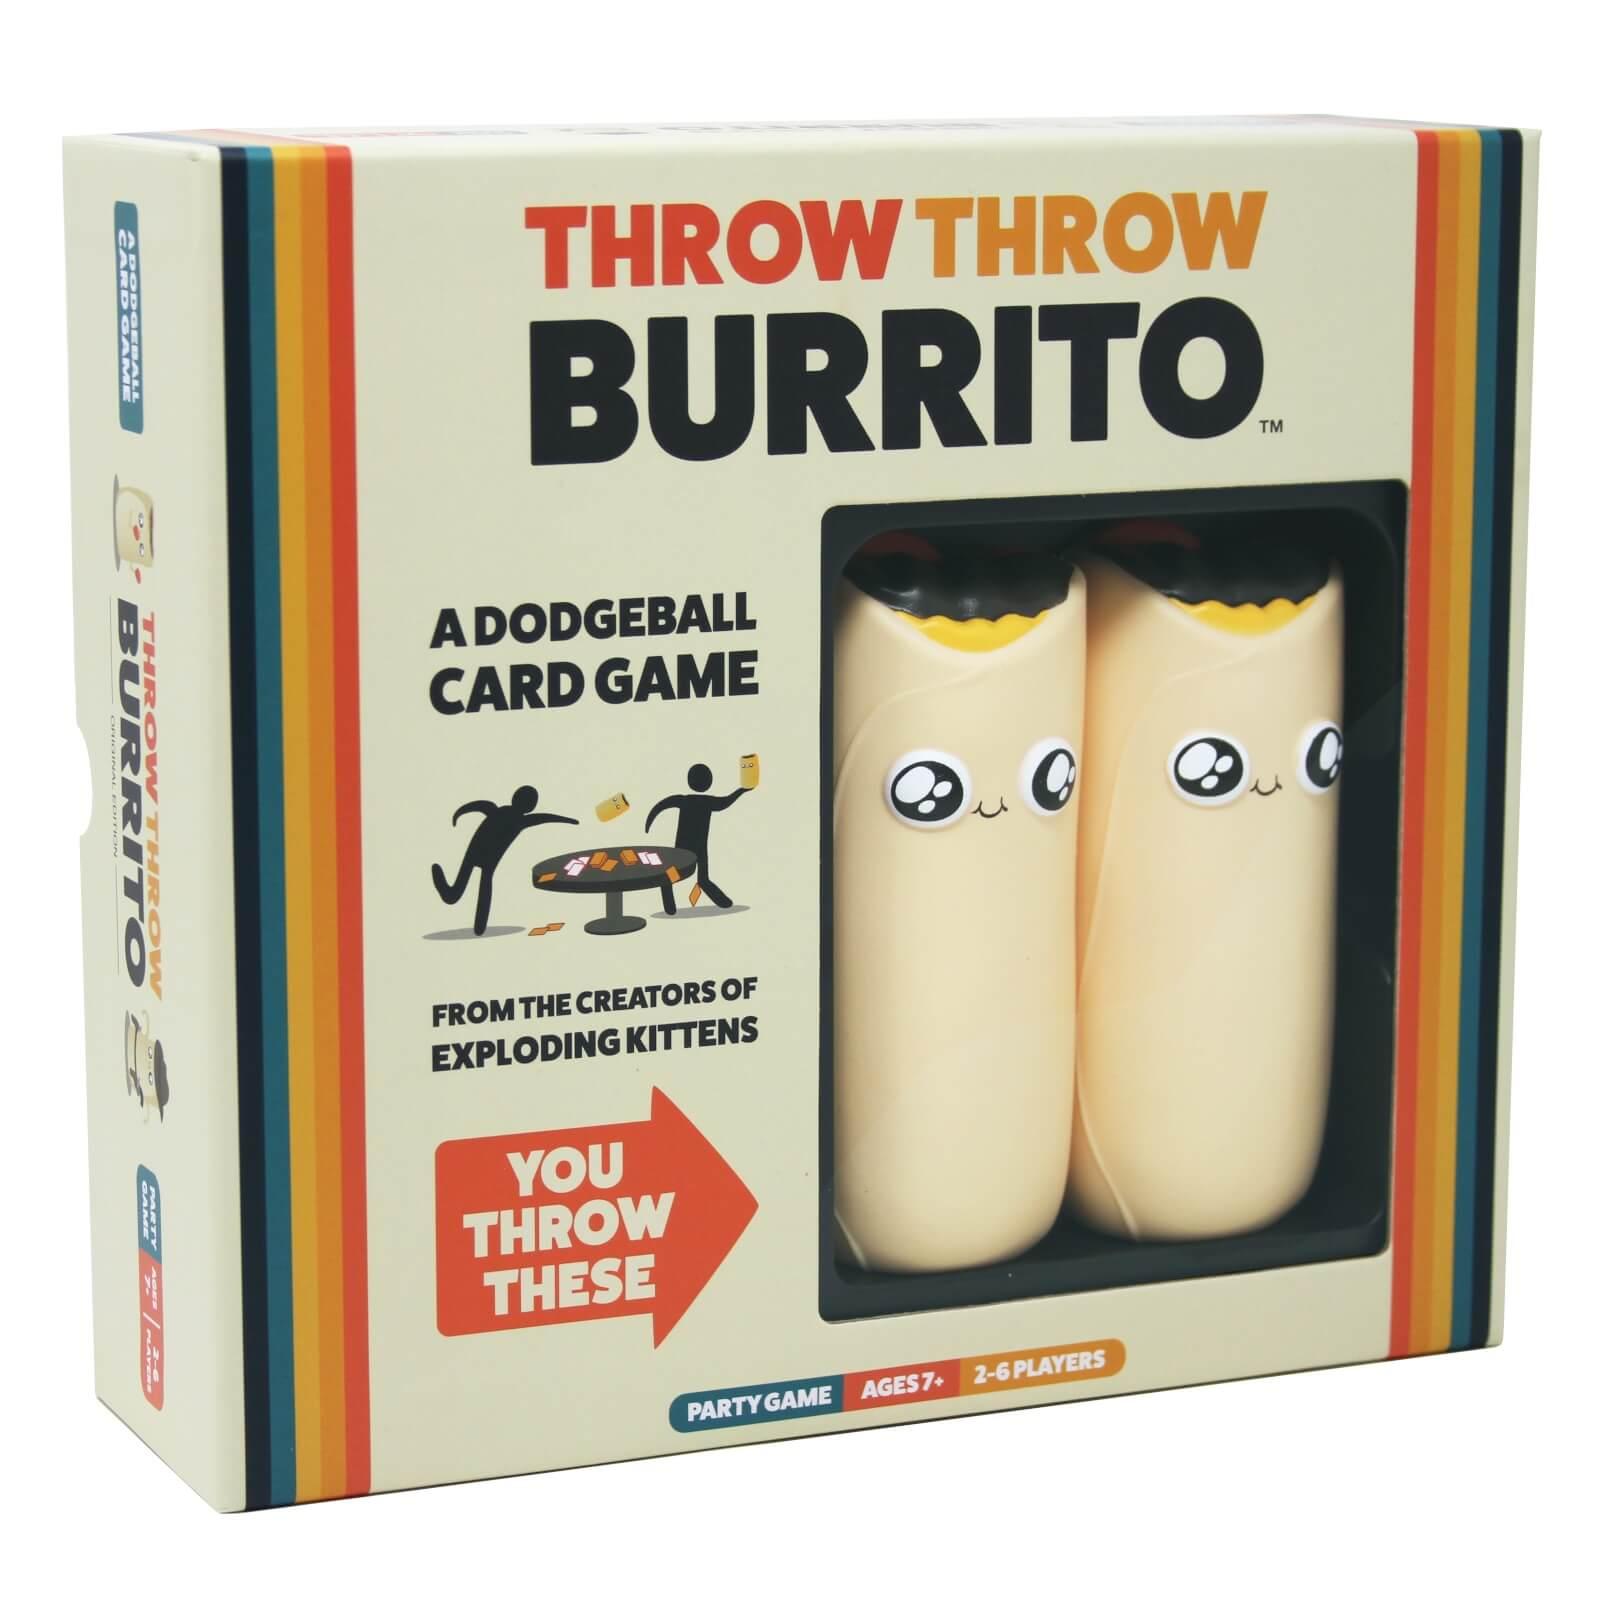 Image of Throw Throw Burrito Card Game